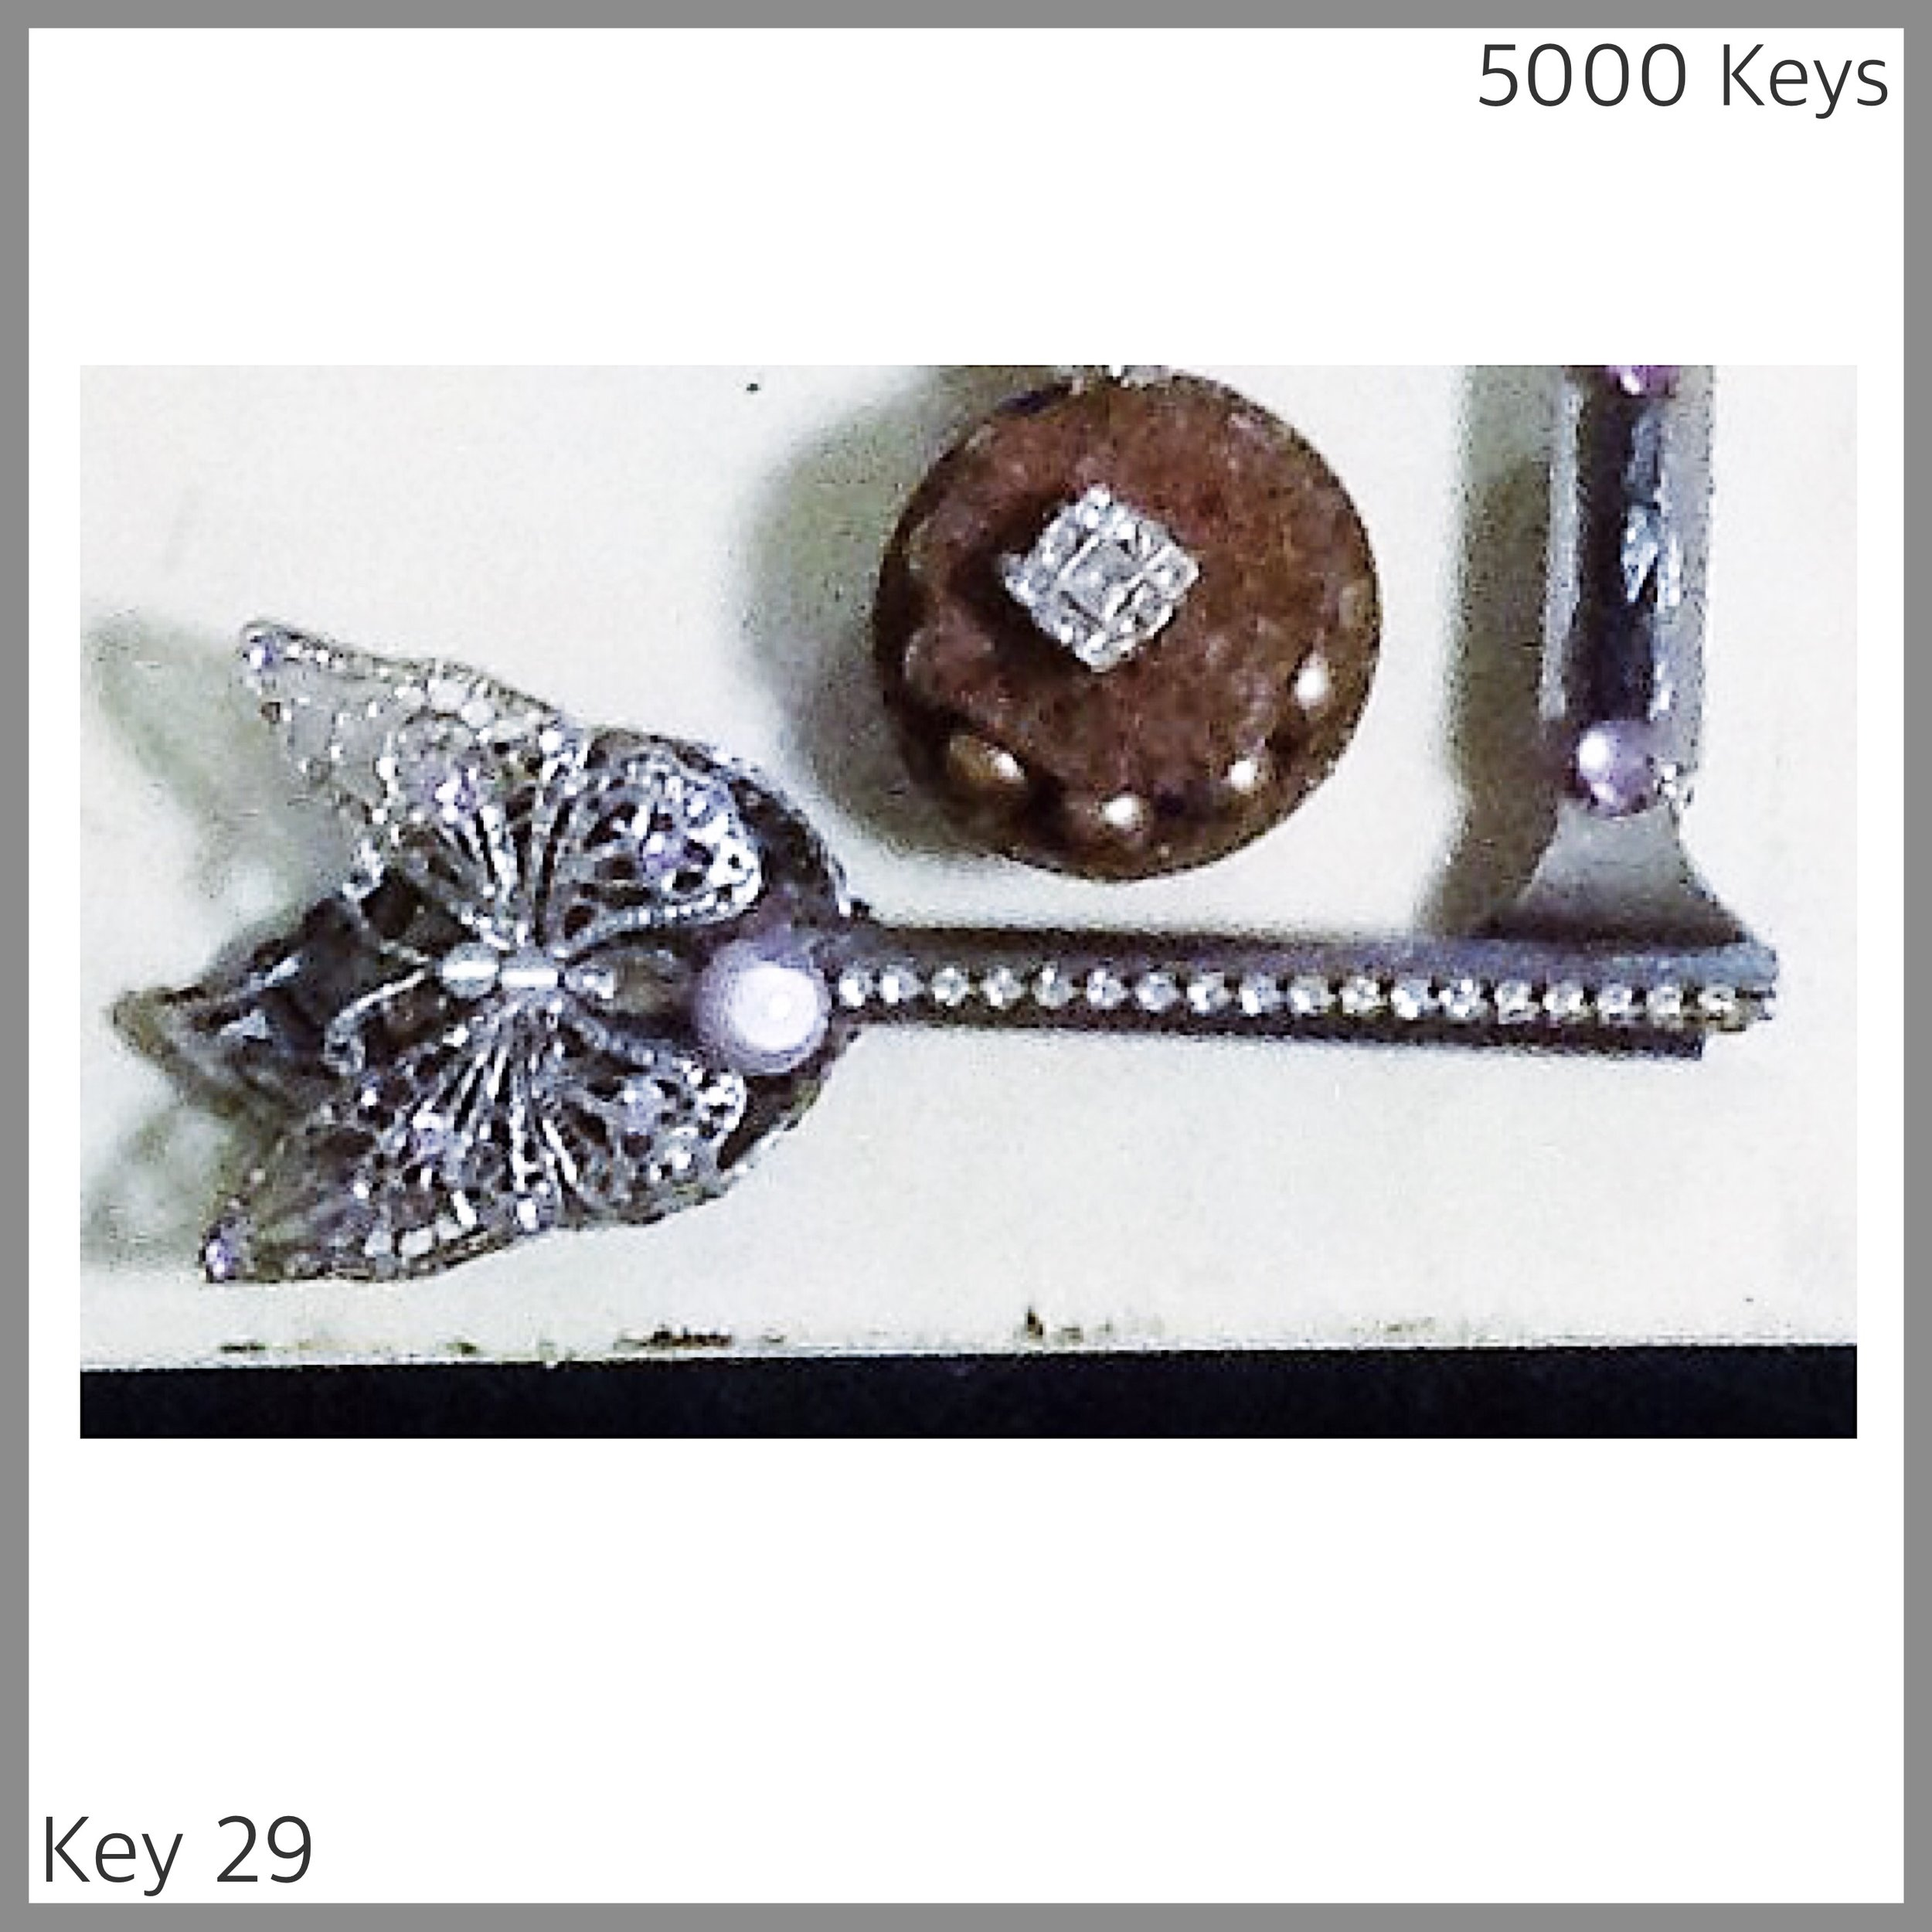 Key 29.jpg